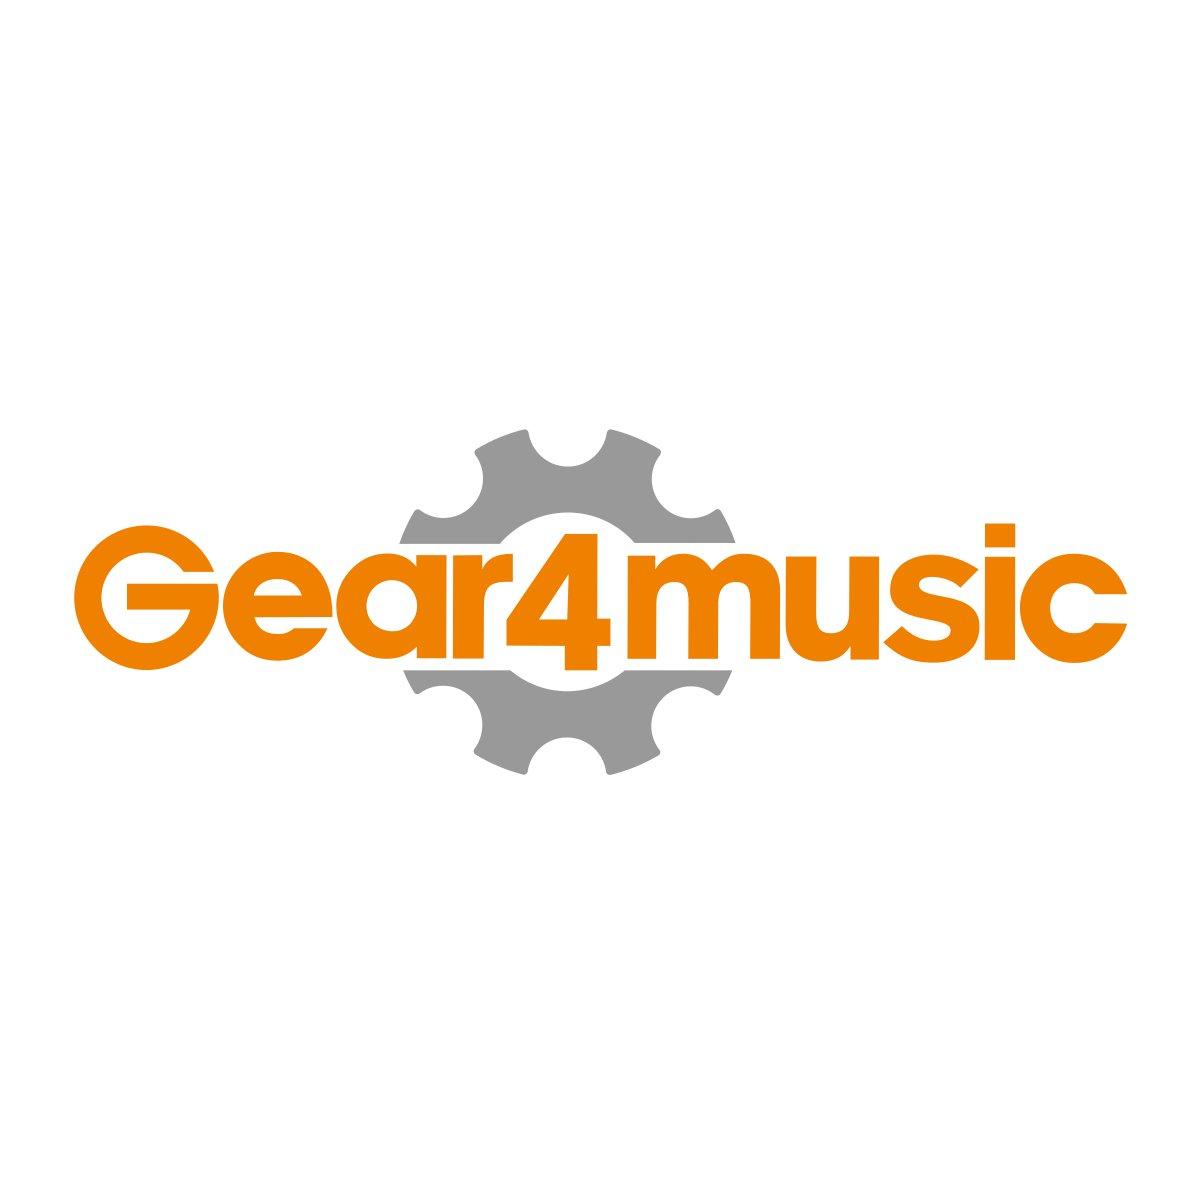 Rosedale professionell altsax spelarpaket, av Gear4music